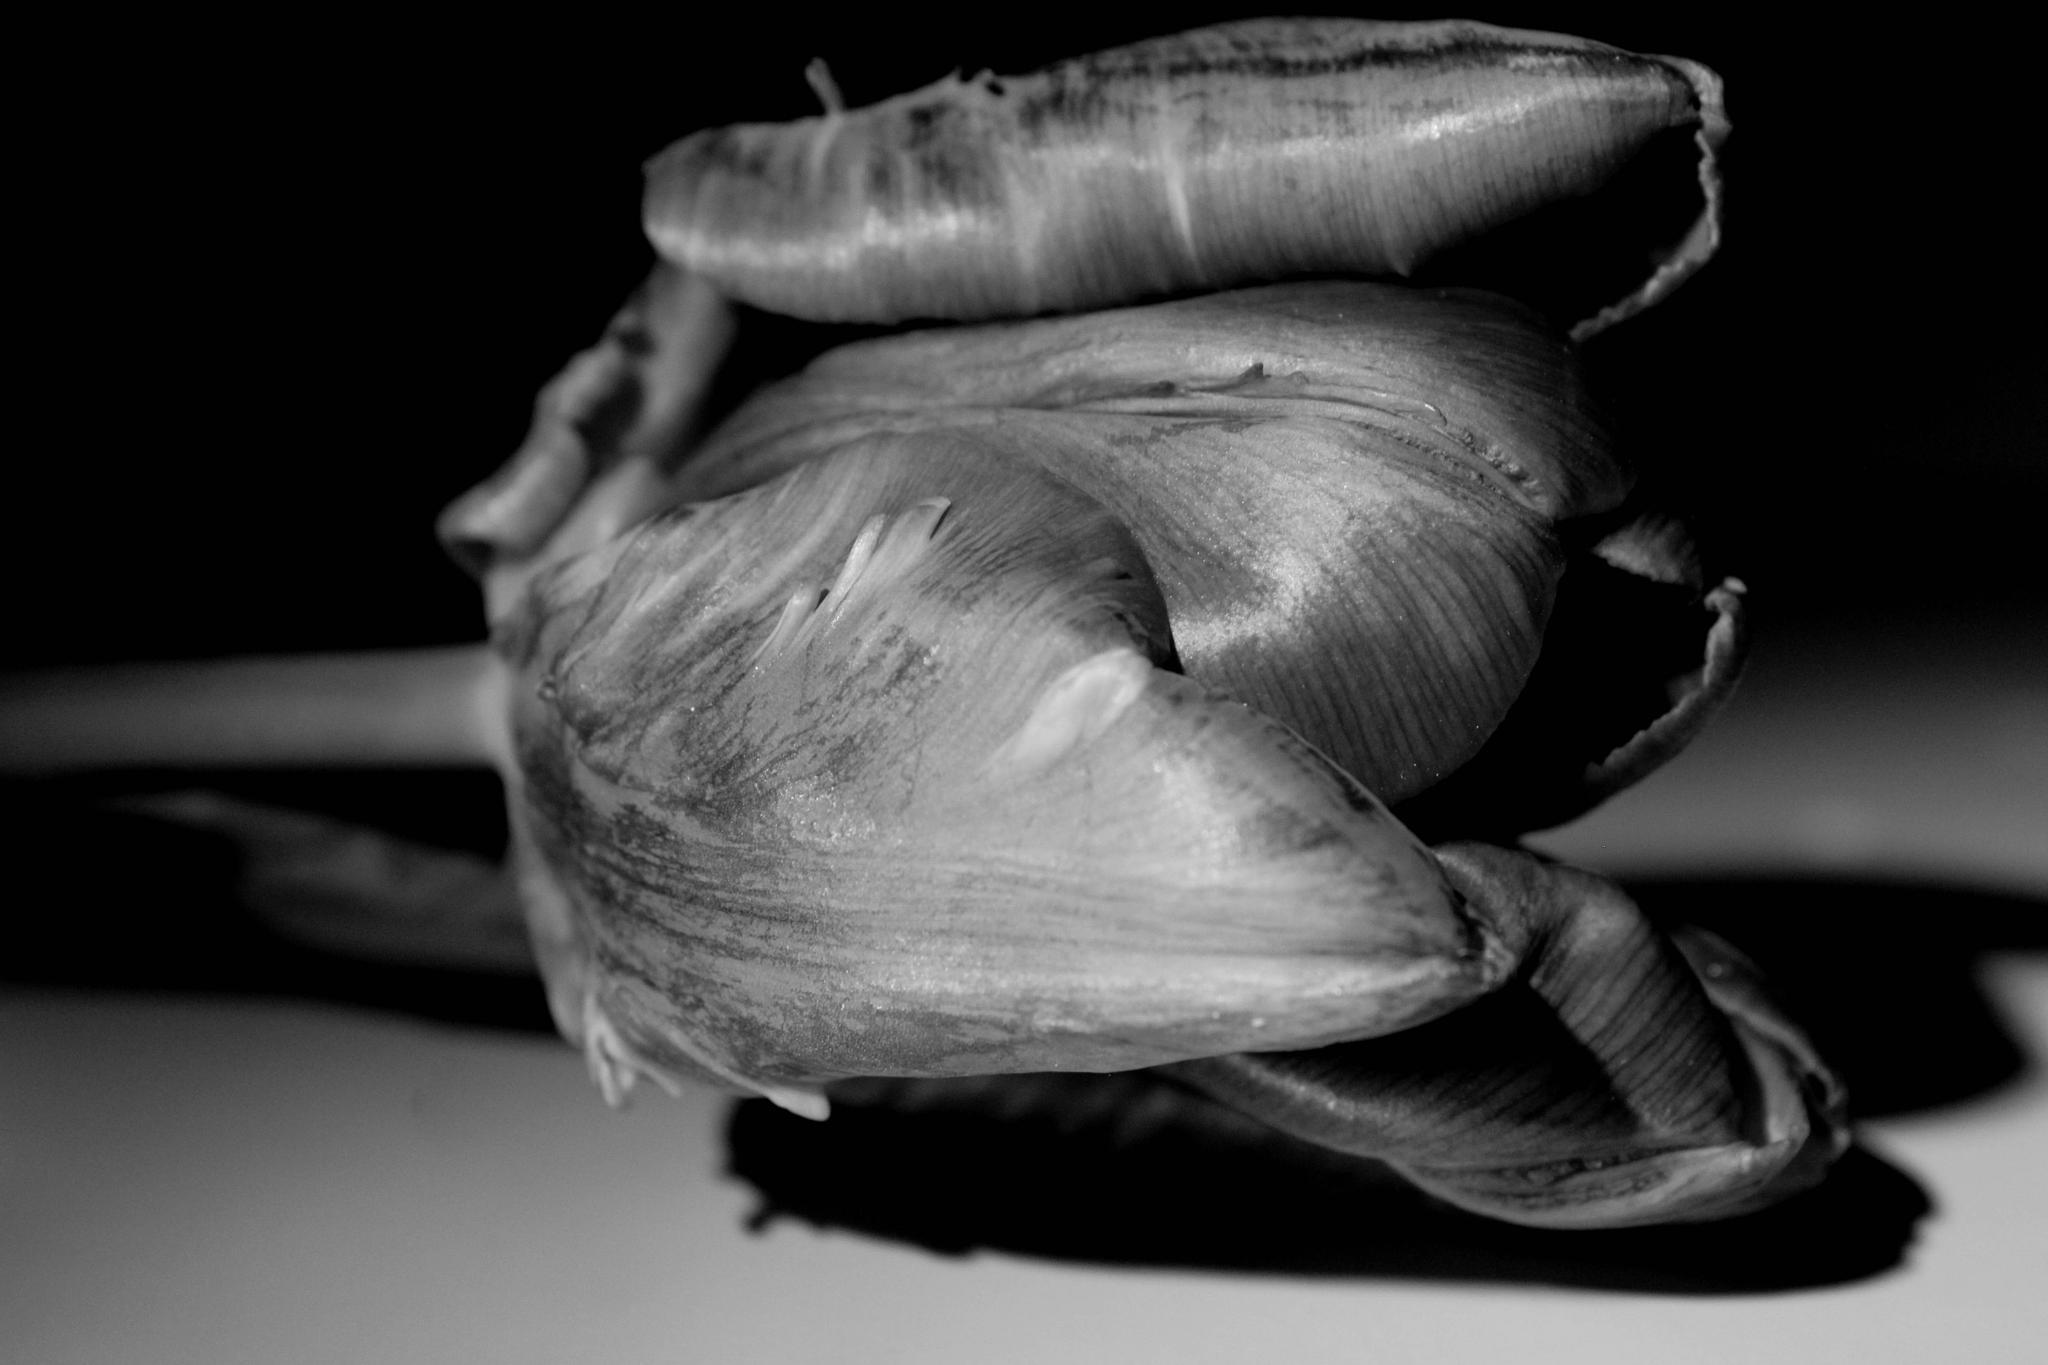 Black tulip by pernillamia